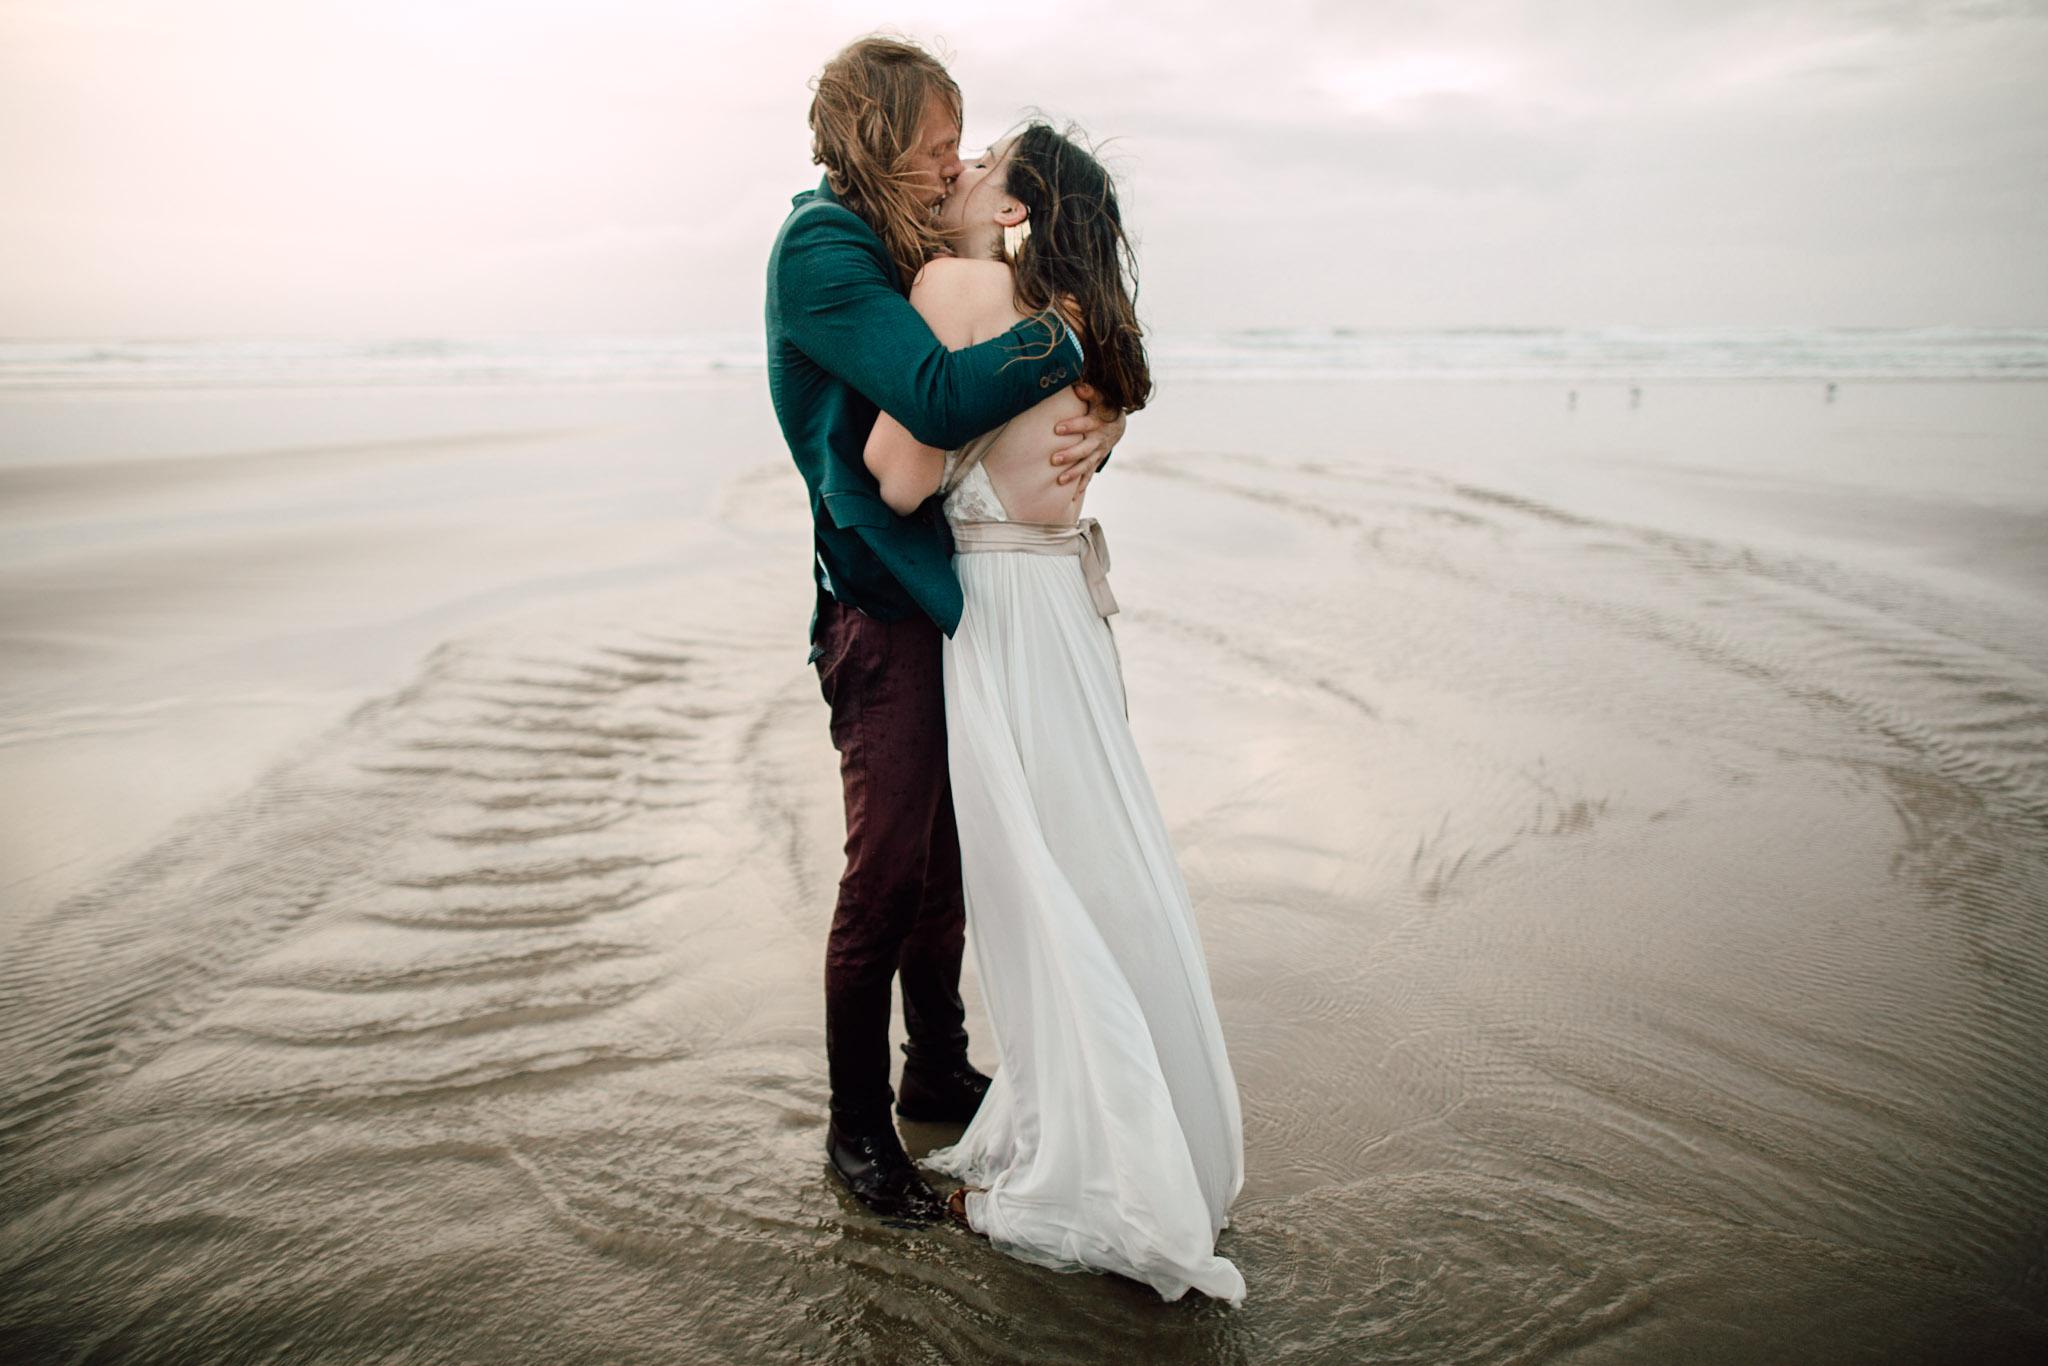 Oregon-Coast-Manzanita-Beach-Engagement-Pia-Anna-Christian-Wedding-Photography-PNW-GB-40.jpg